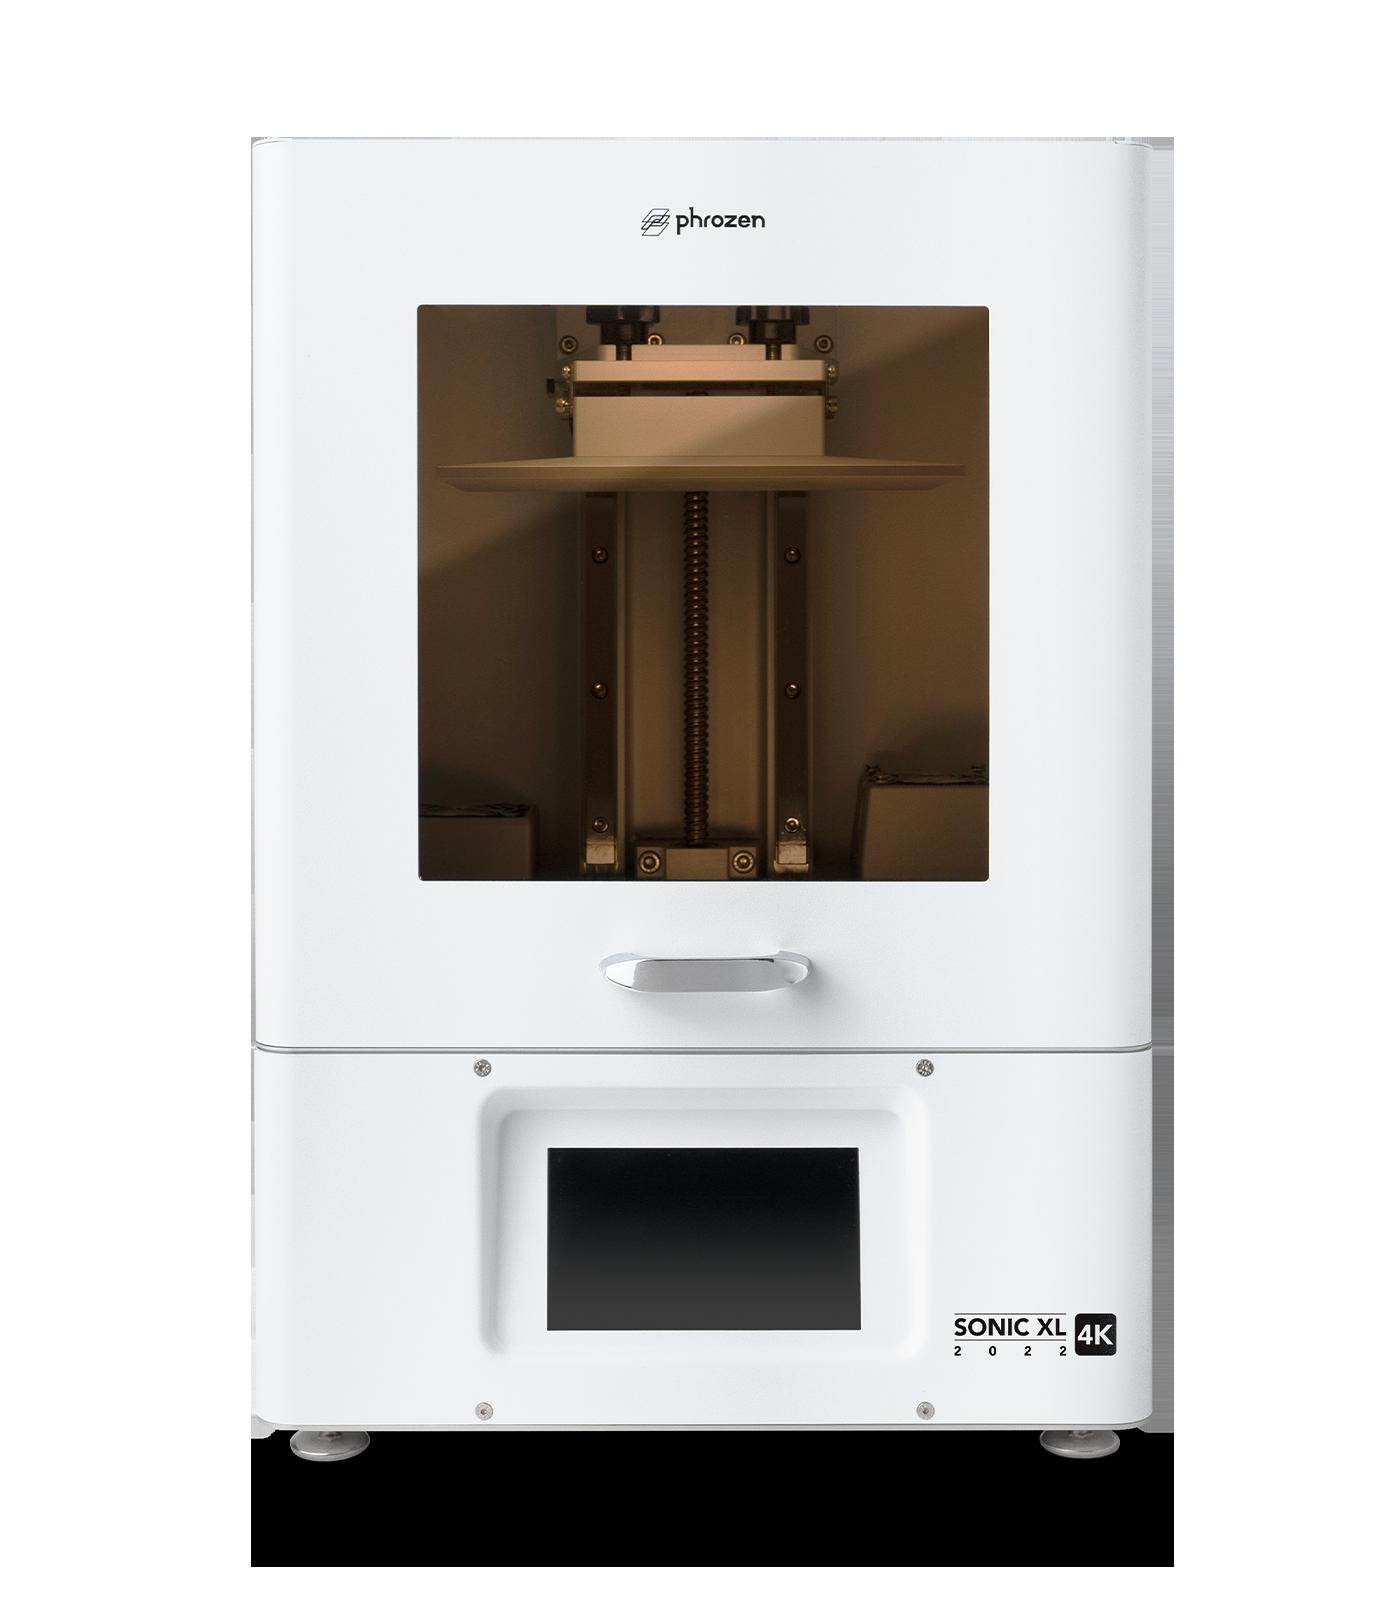 Imprimanta 3D PhrozenSonic  XL 4K